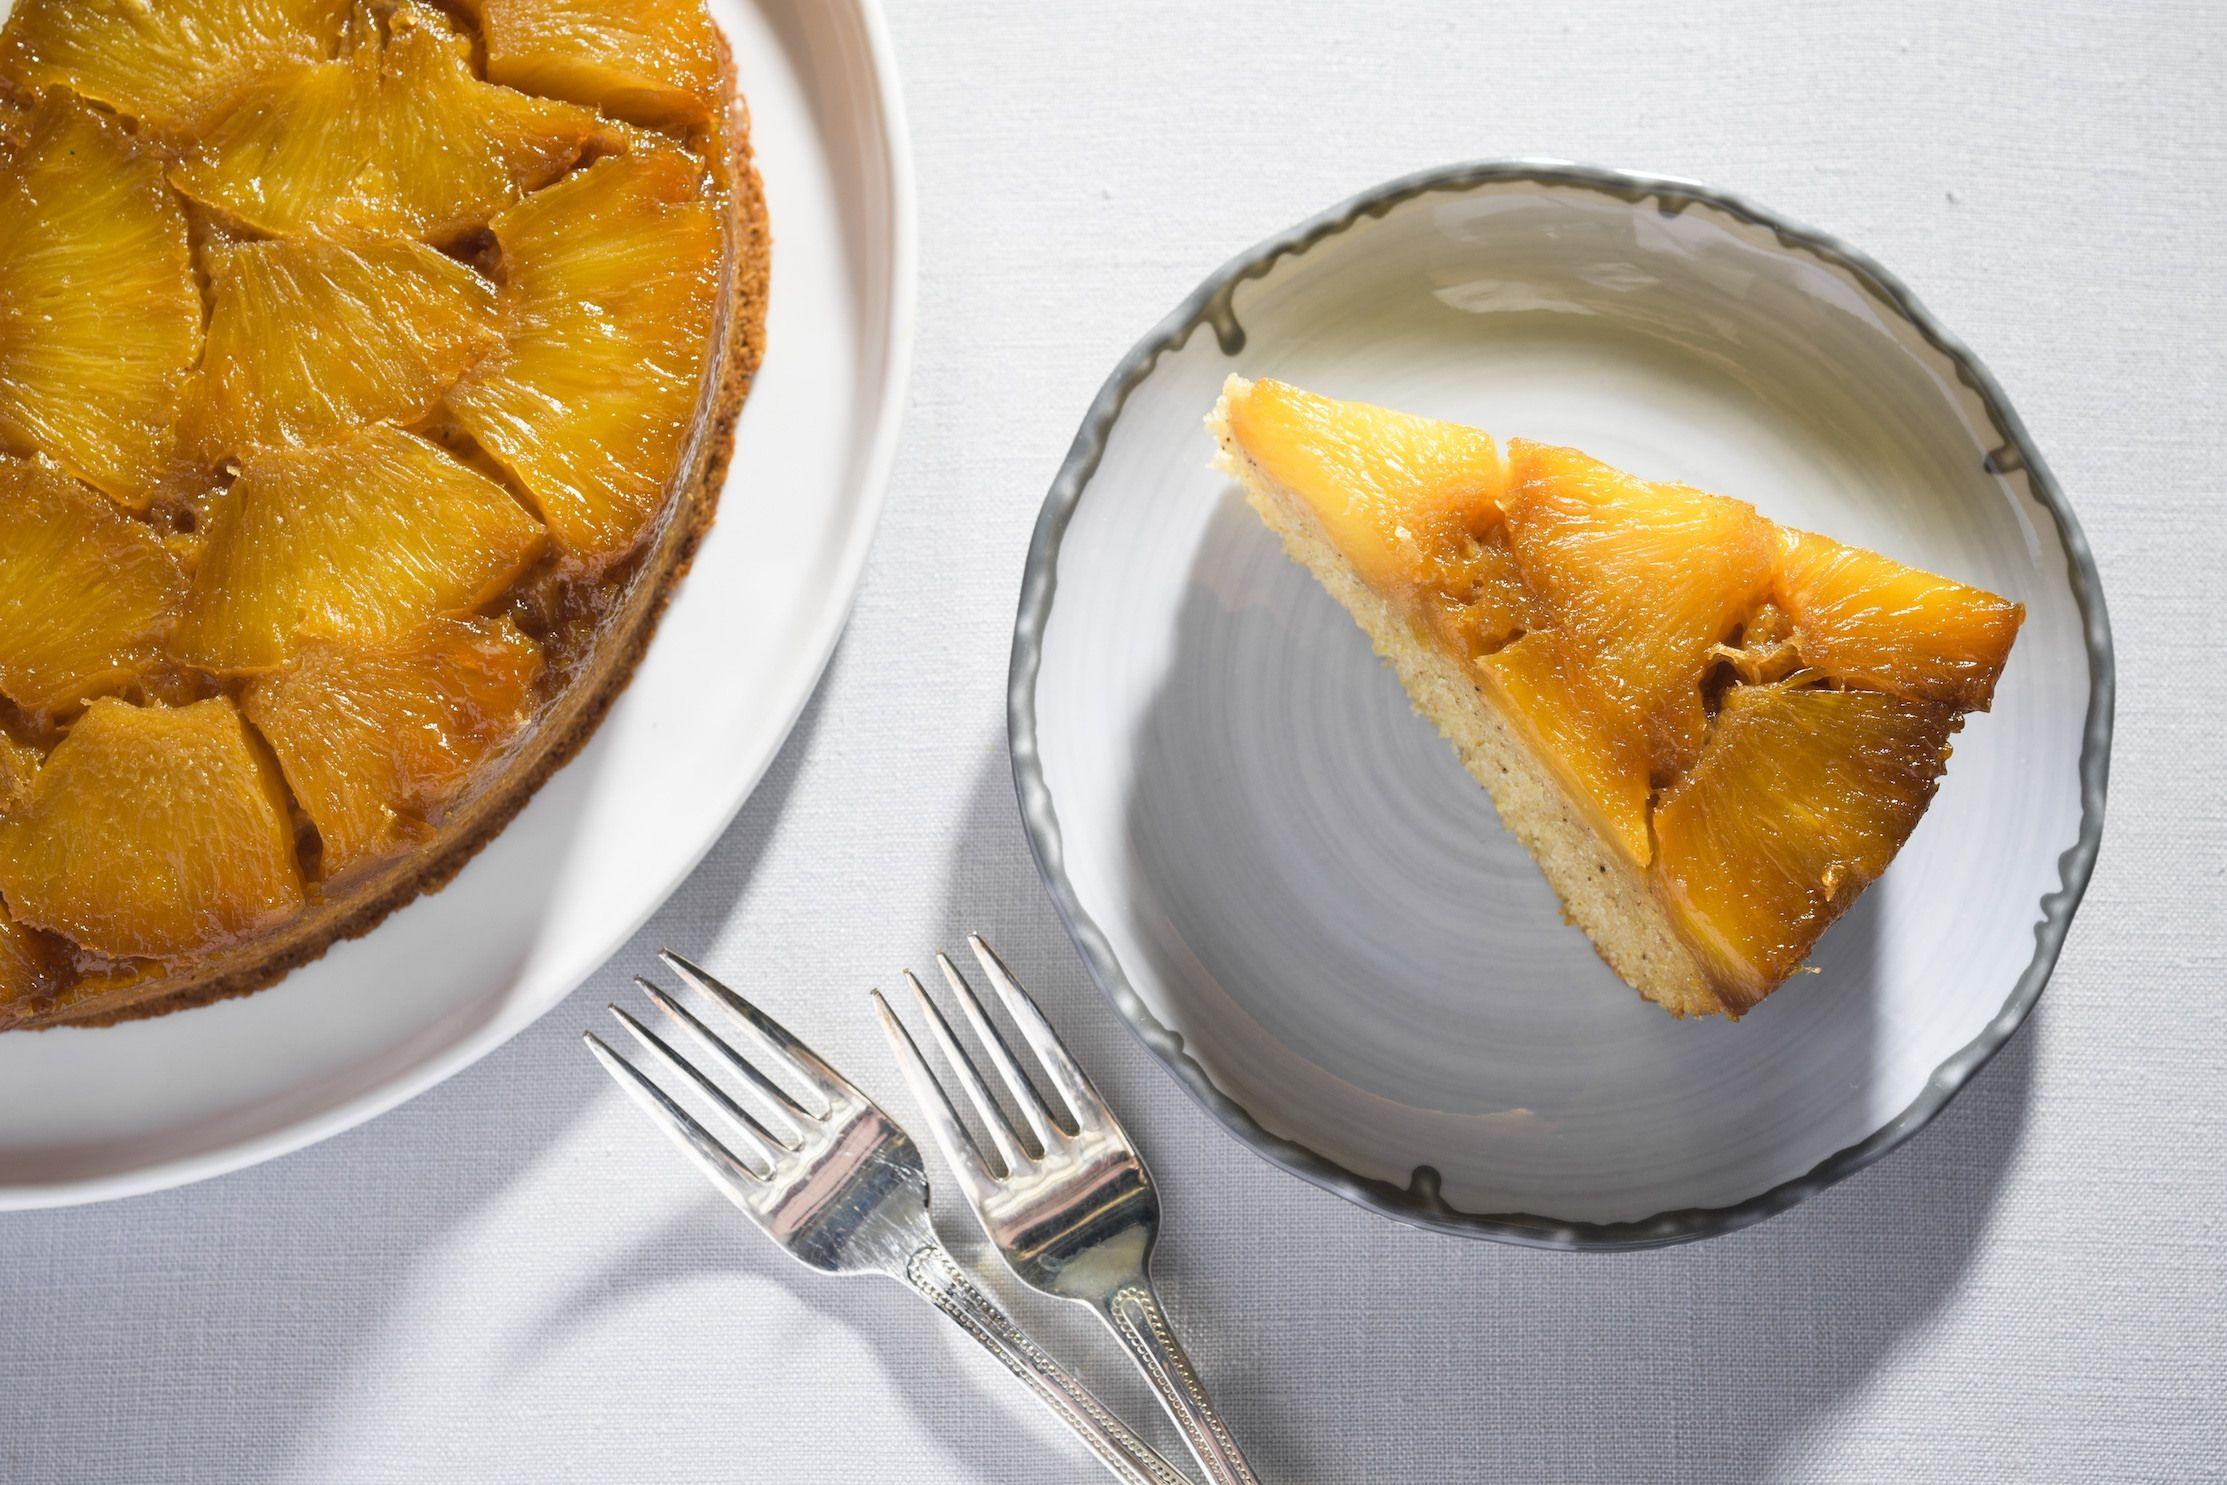 Pineapple Upside-Down Cornmeal Cake